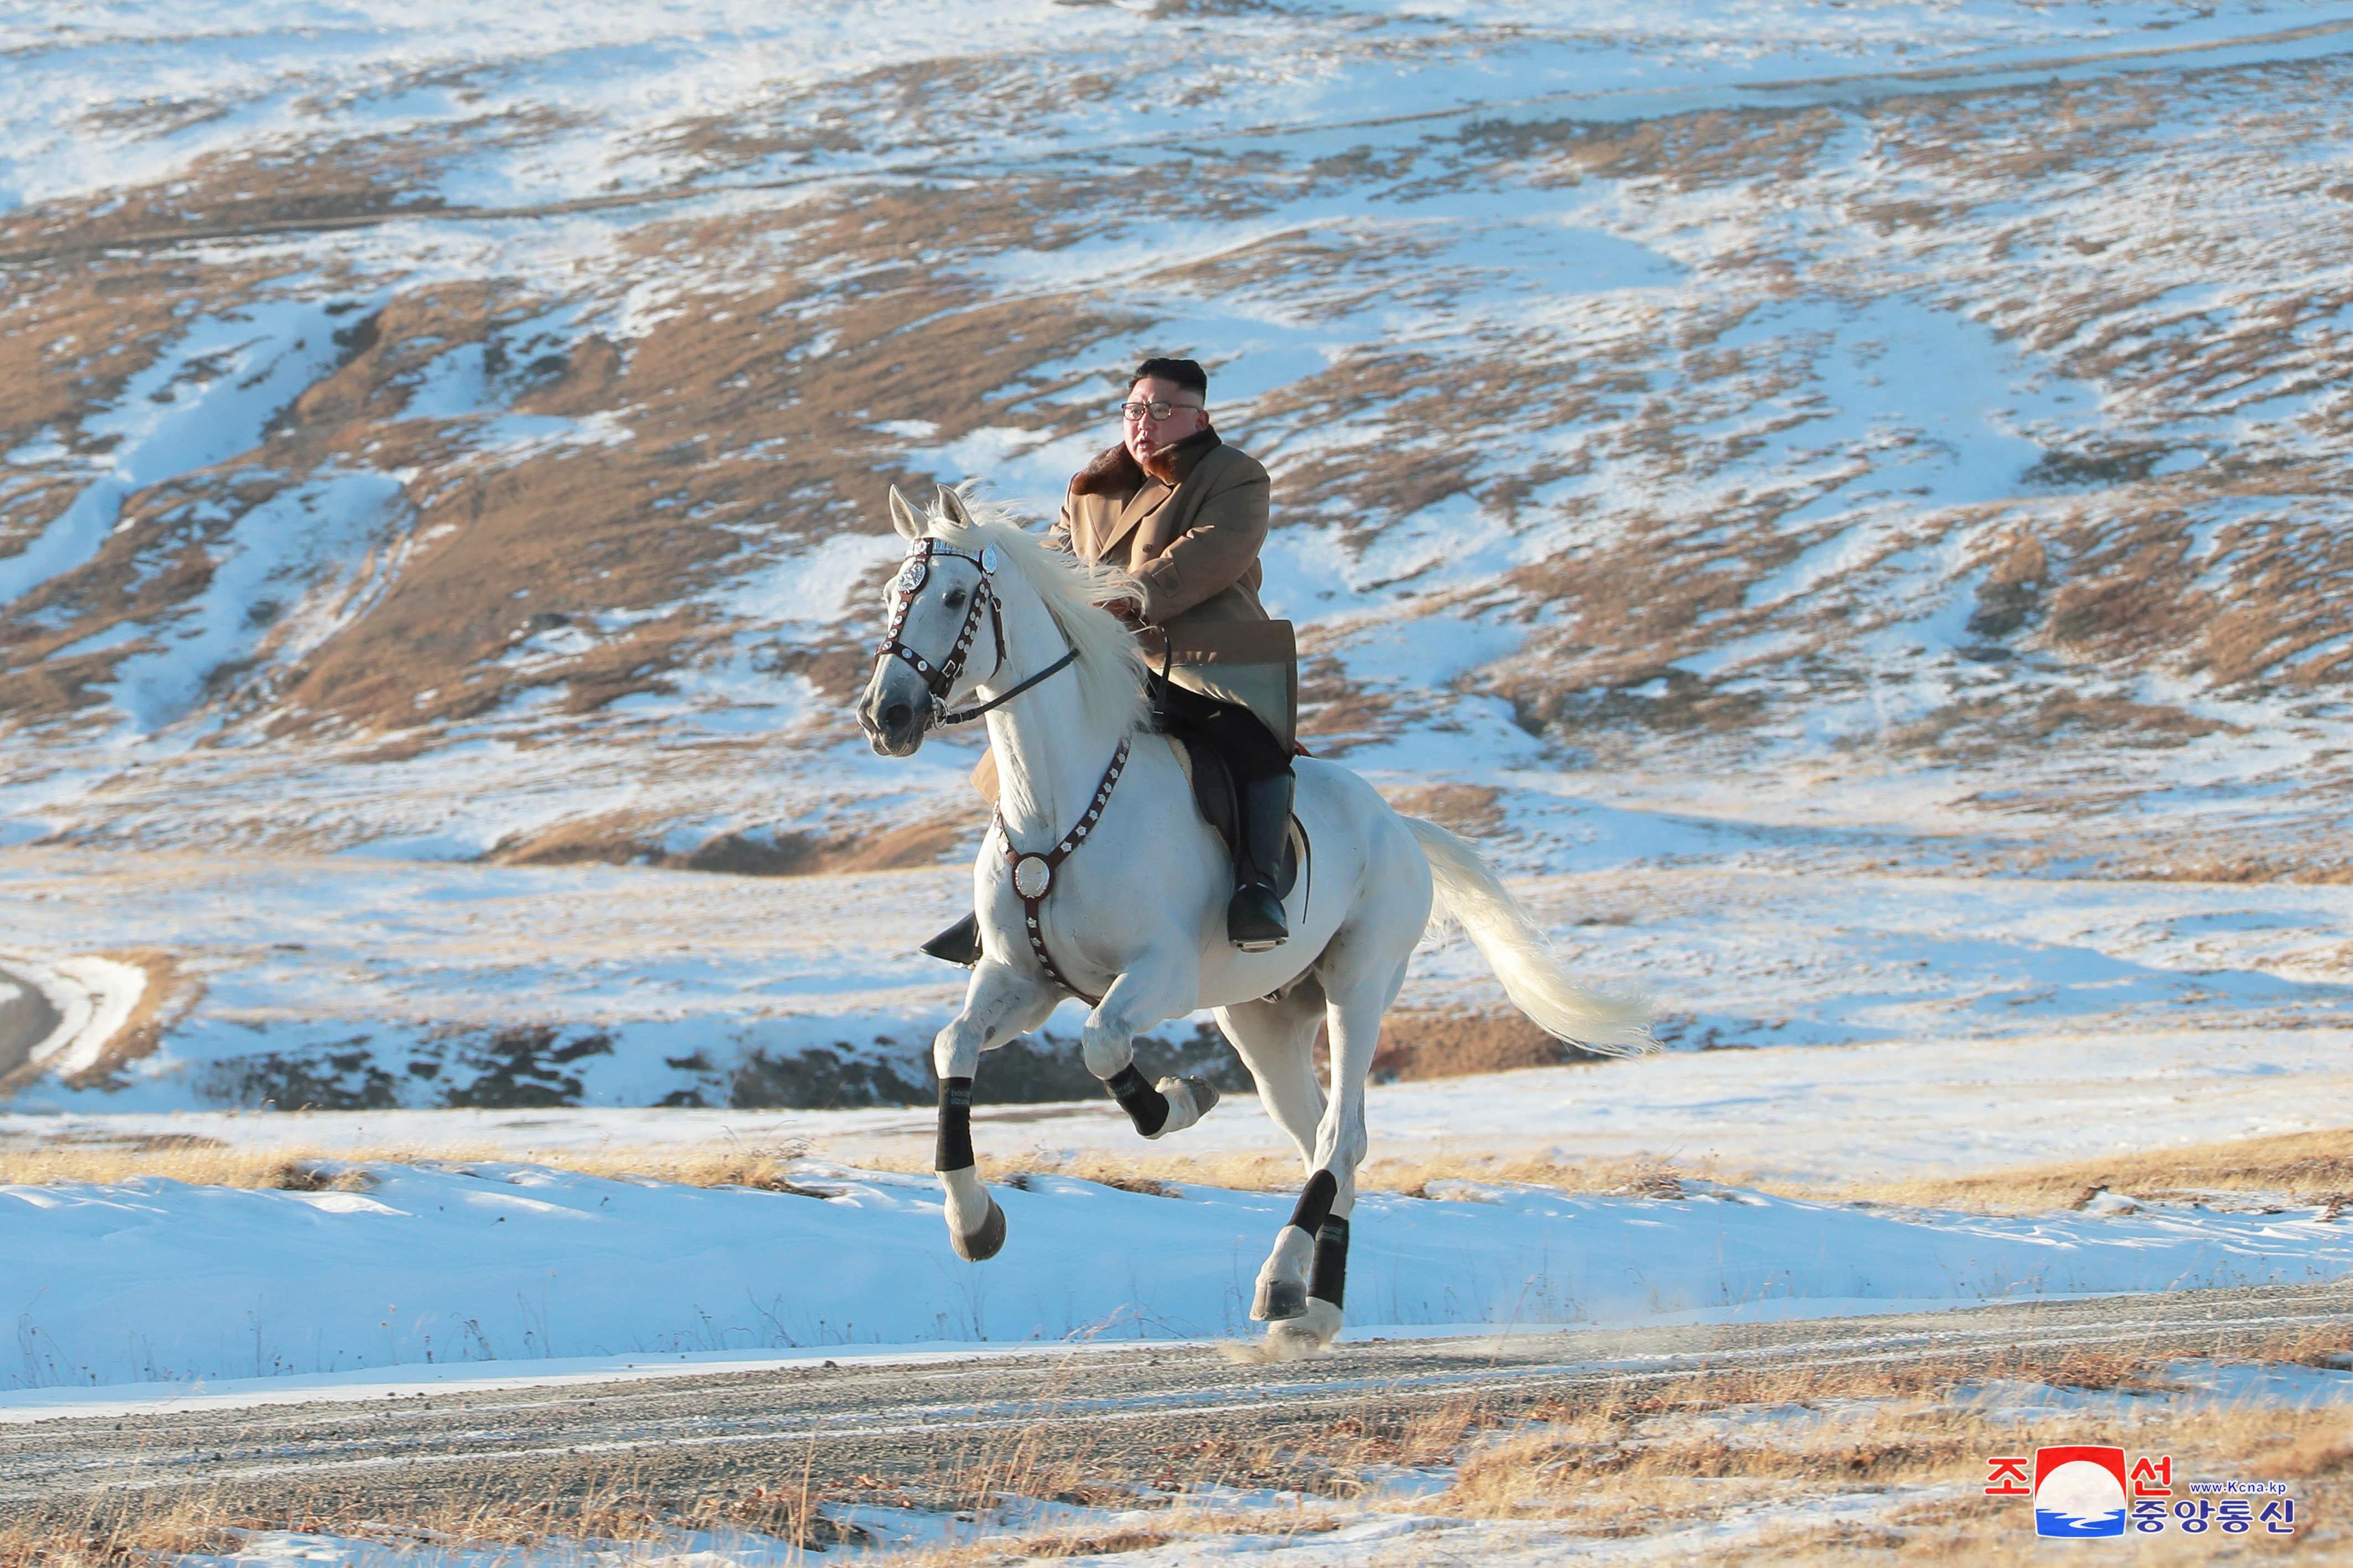 The North Korean history behind Kim Jong Un's mountain horse ride